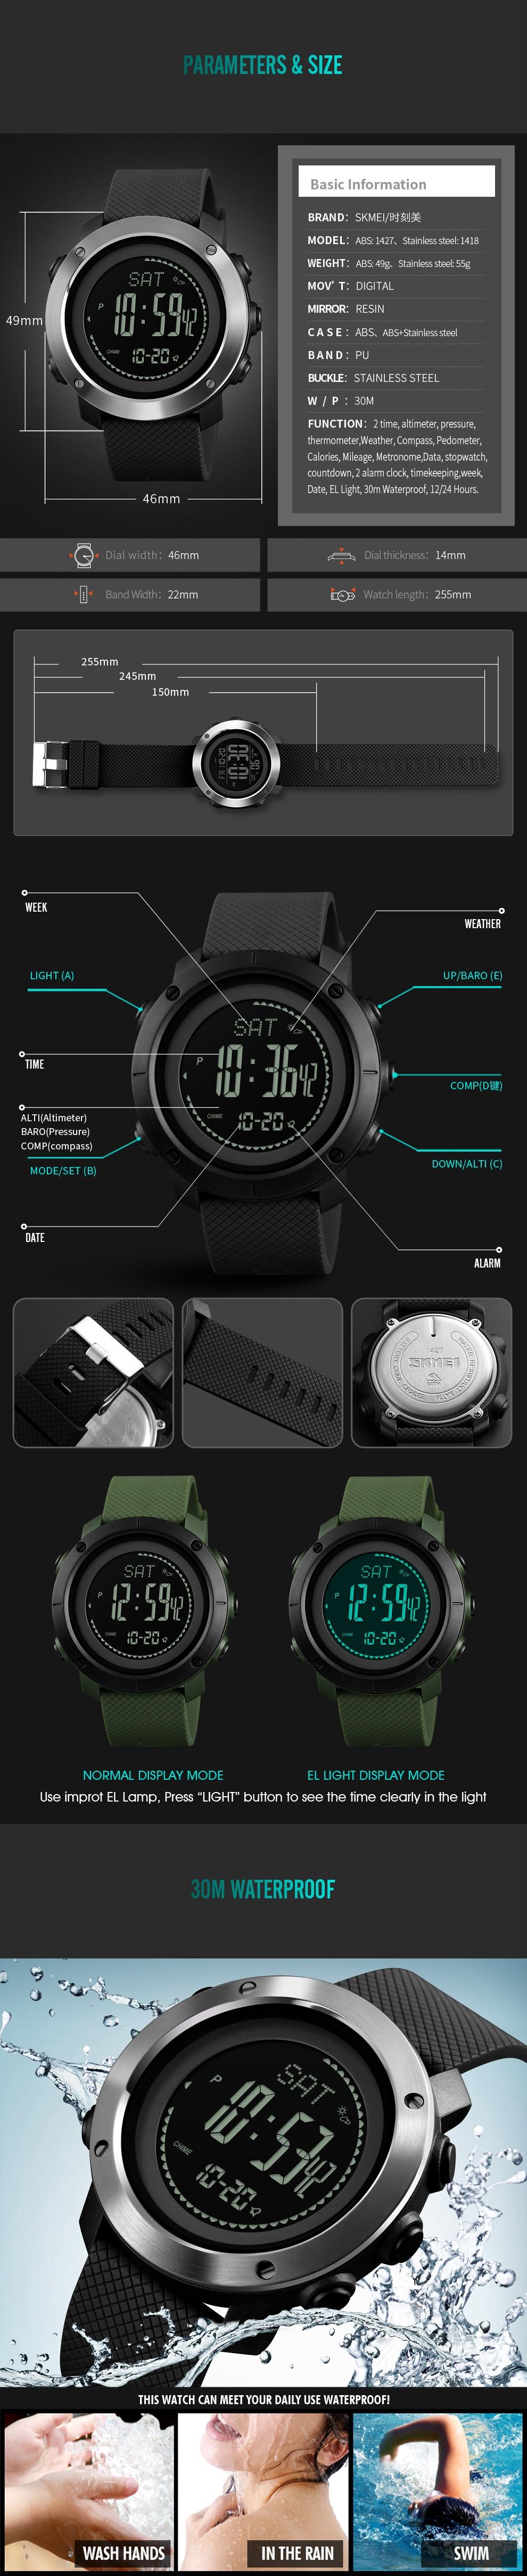 SKMEI Altimeter Barometer Thermometer Altitude Men Digital Watches Sports Clock Climbing Hiking Wristwatch Montre Homme 1418 10